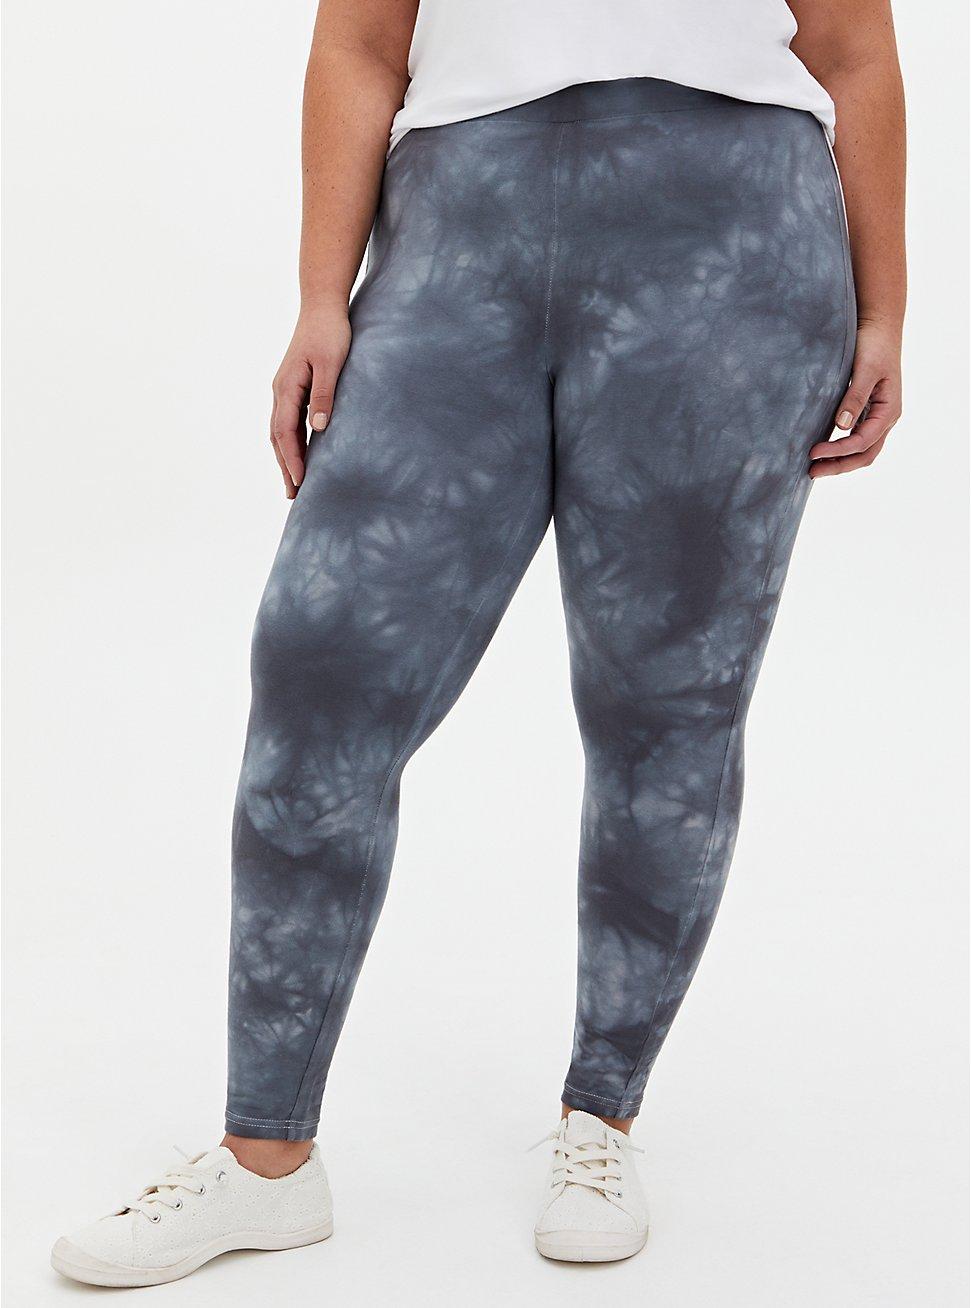 Plus Size Premium Legging - Tie-Dye Dark Grey, GREY, hi-res